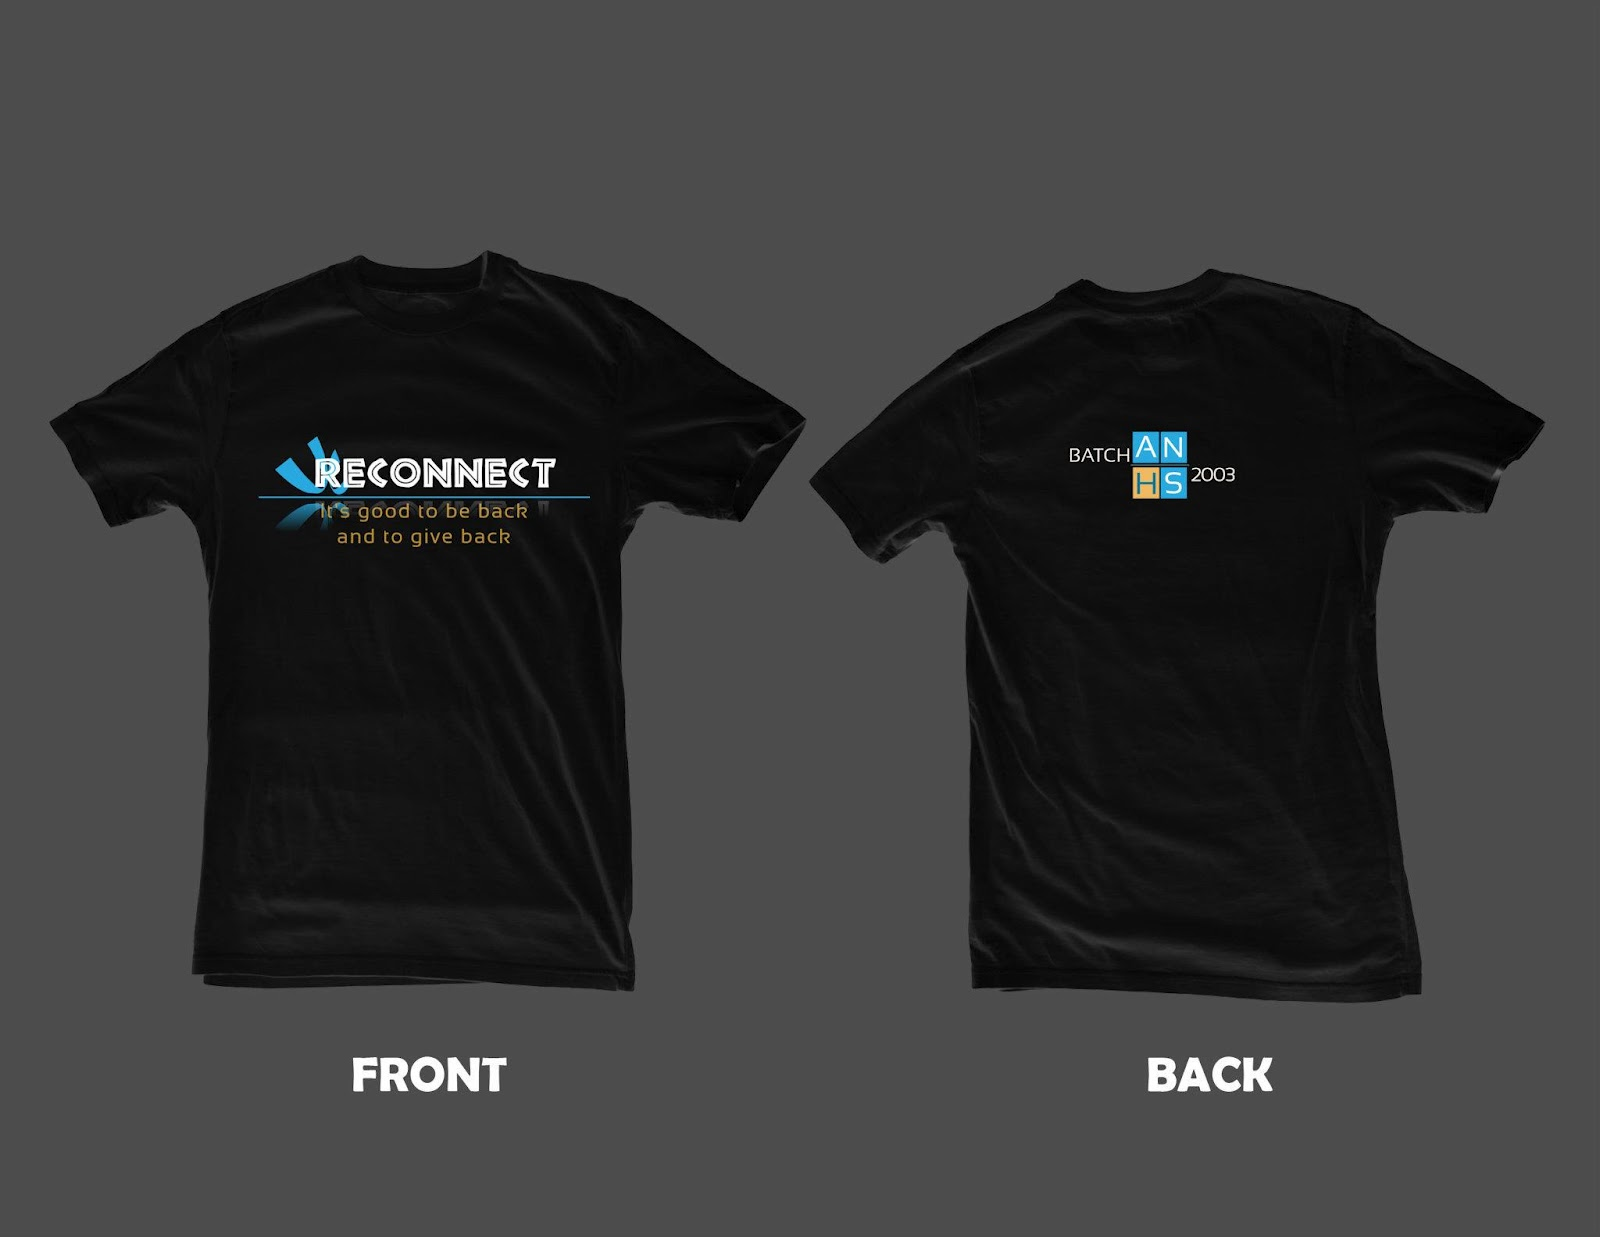 Shirt design for alumni homecoming - The Official T Shirt Design For The Homecoming